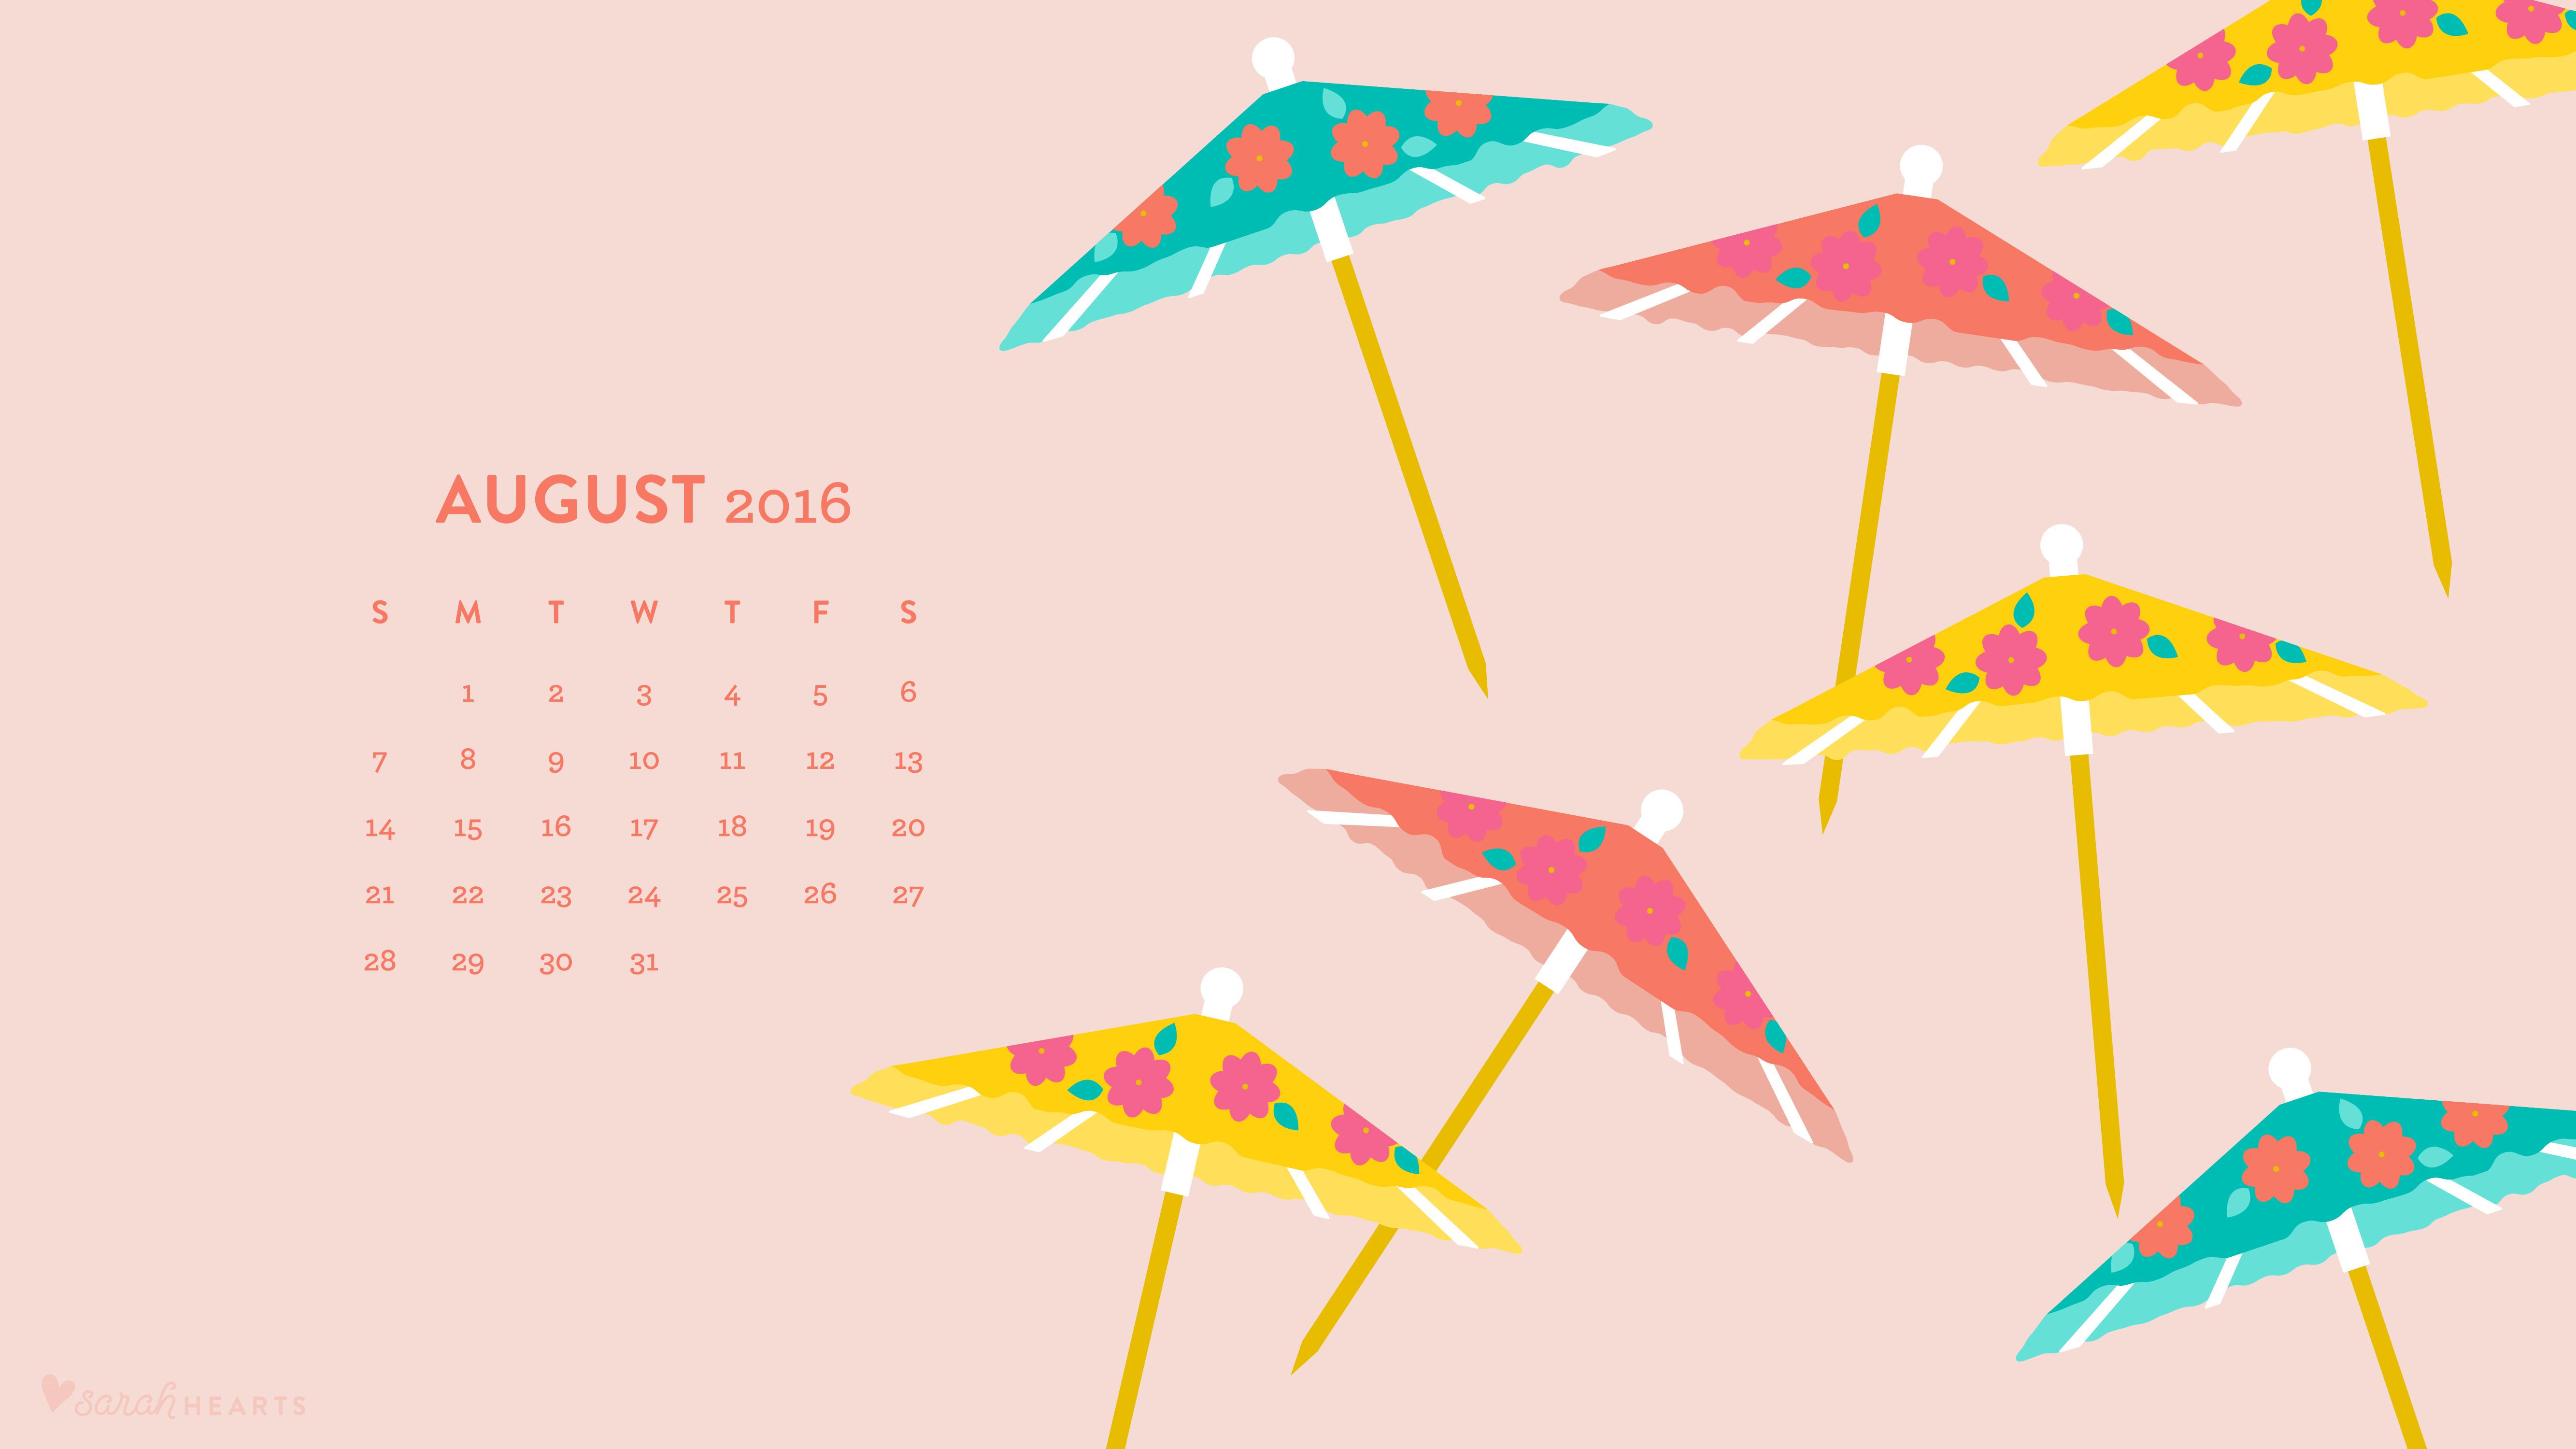 August 2016 Drink Umbrella Wallpaper